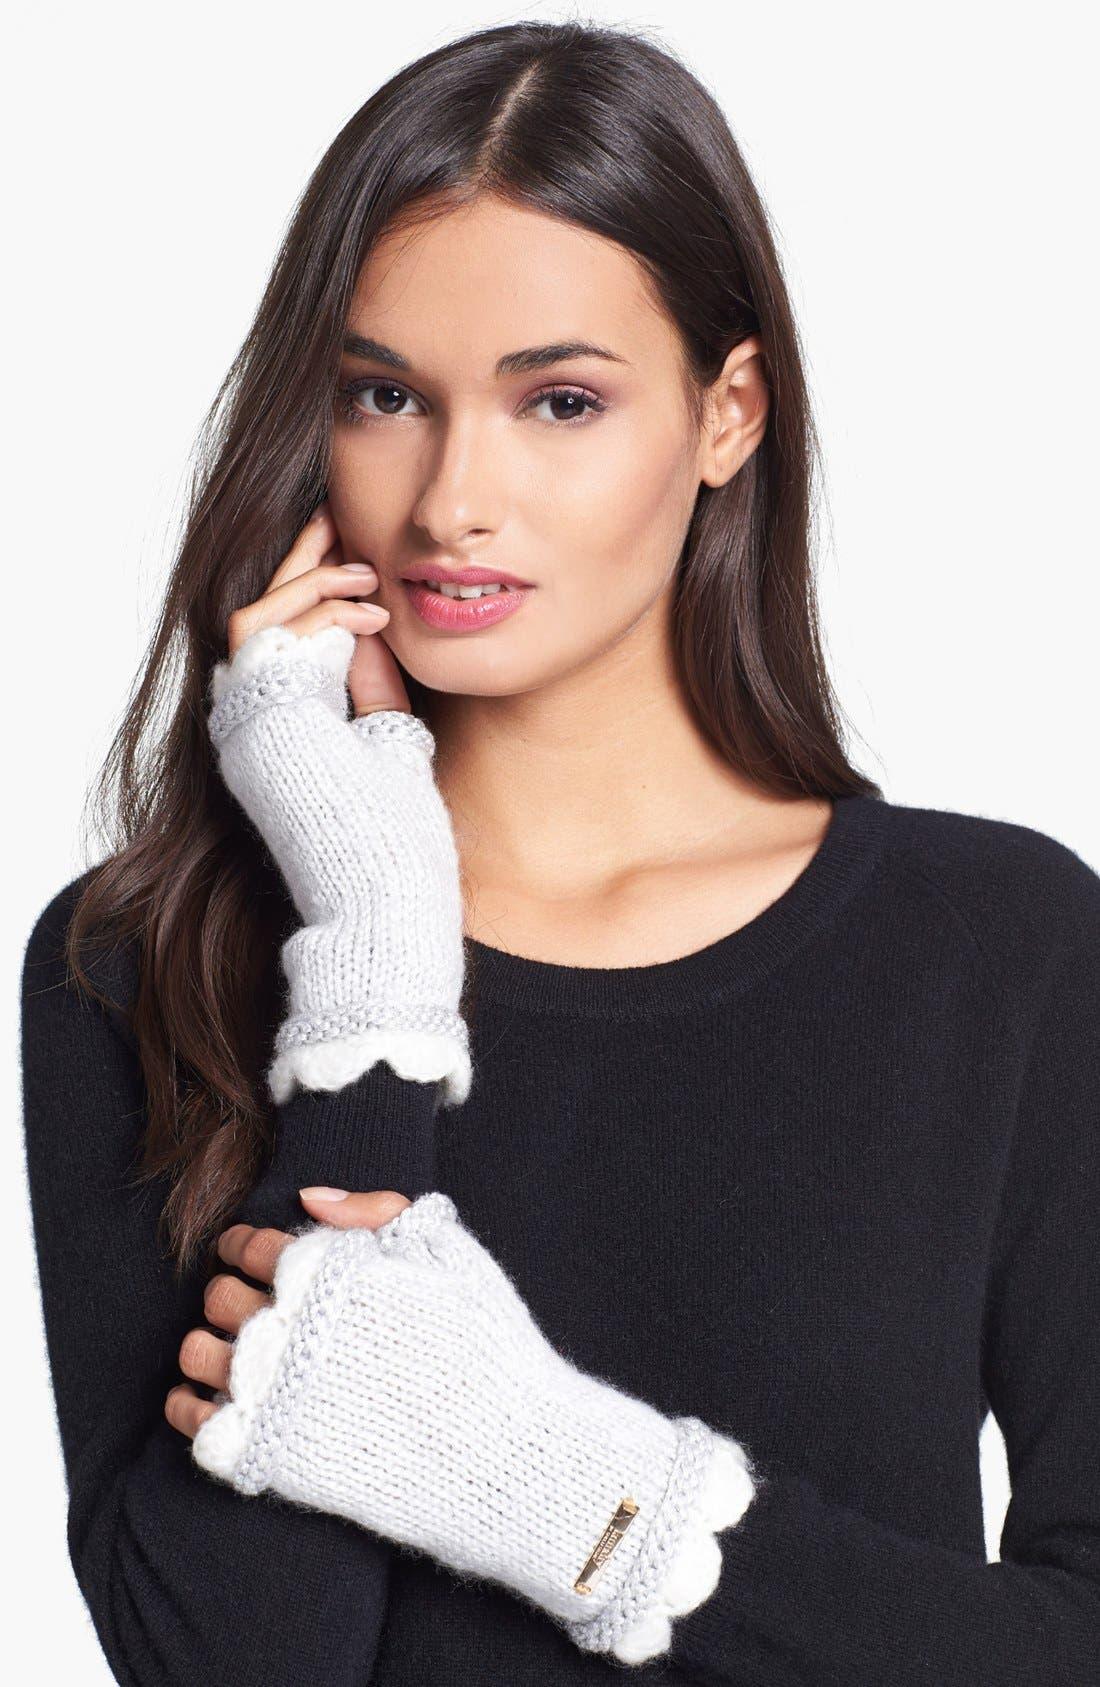 Alternate Image 1 Selected - Laundry by Shelli Segal 'Baroque Romantics' Fingerless Gloves